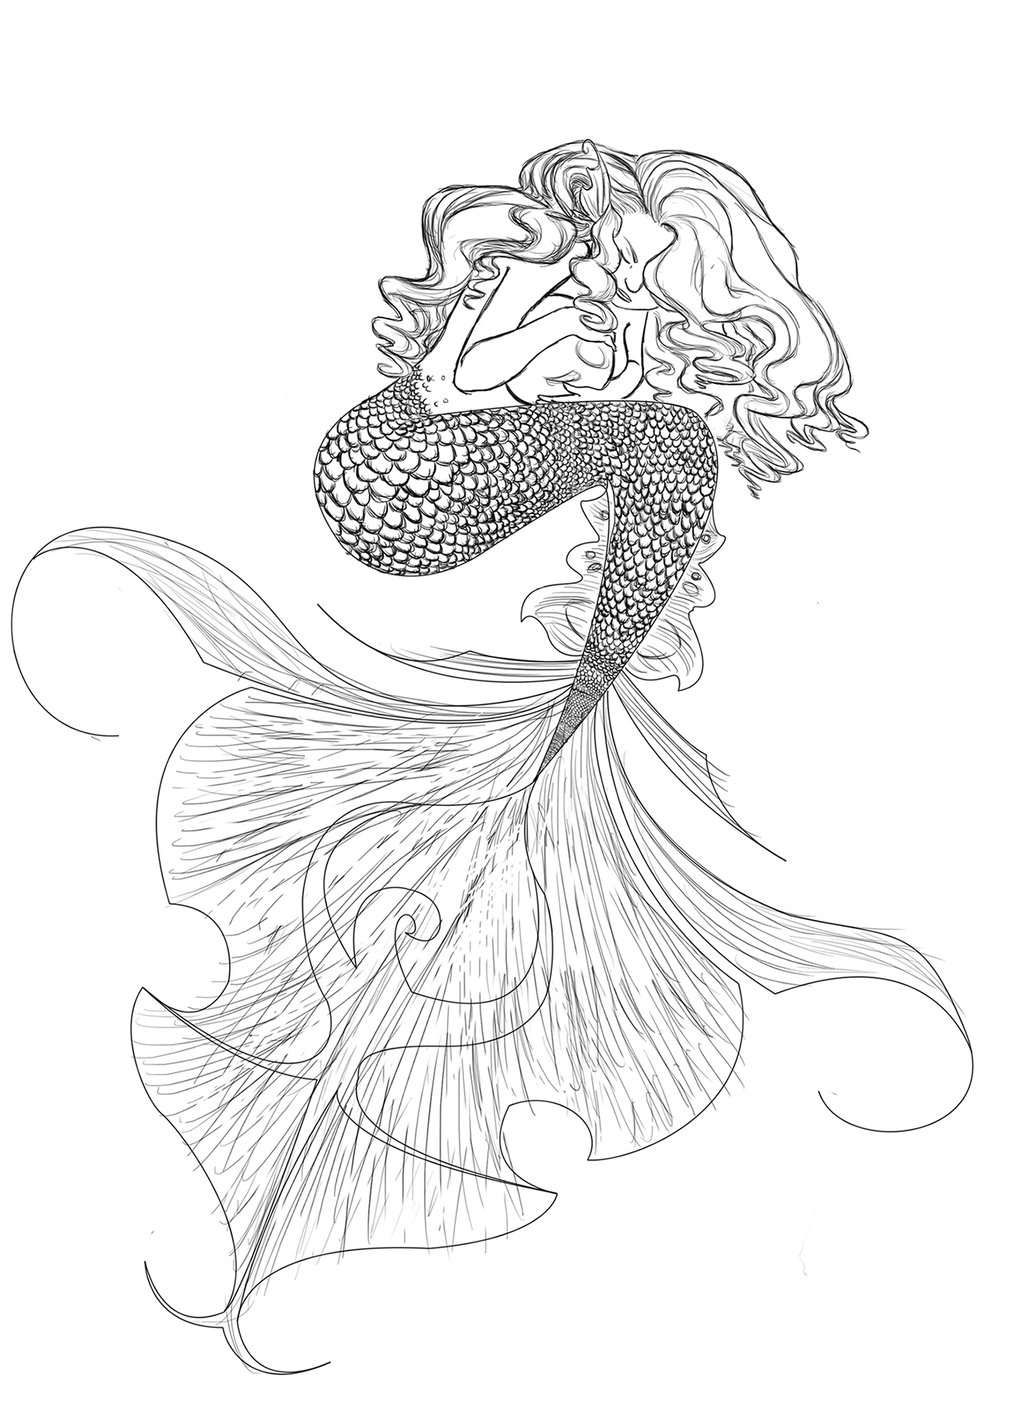 1024x1426 Mermaid line drawing by JoceGurr on DeviantArt